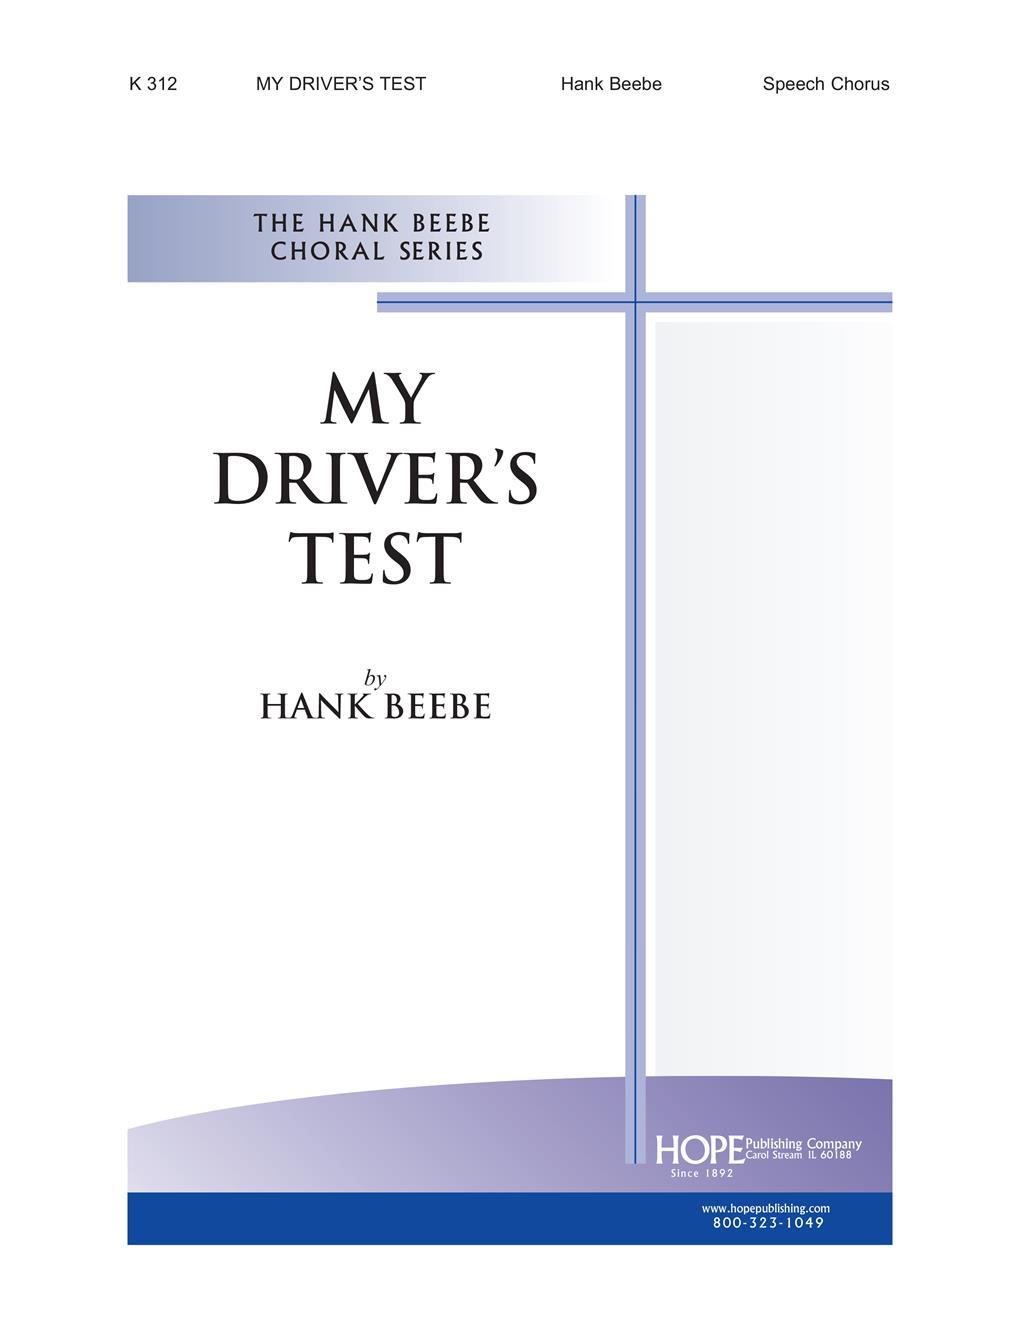 My Driver's Test - Speech Chorus Cover Image